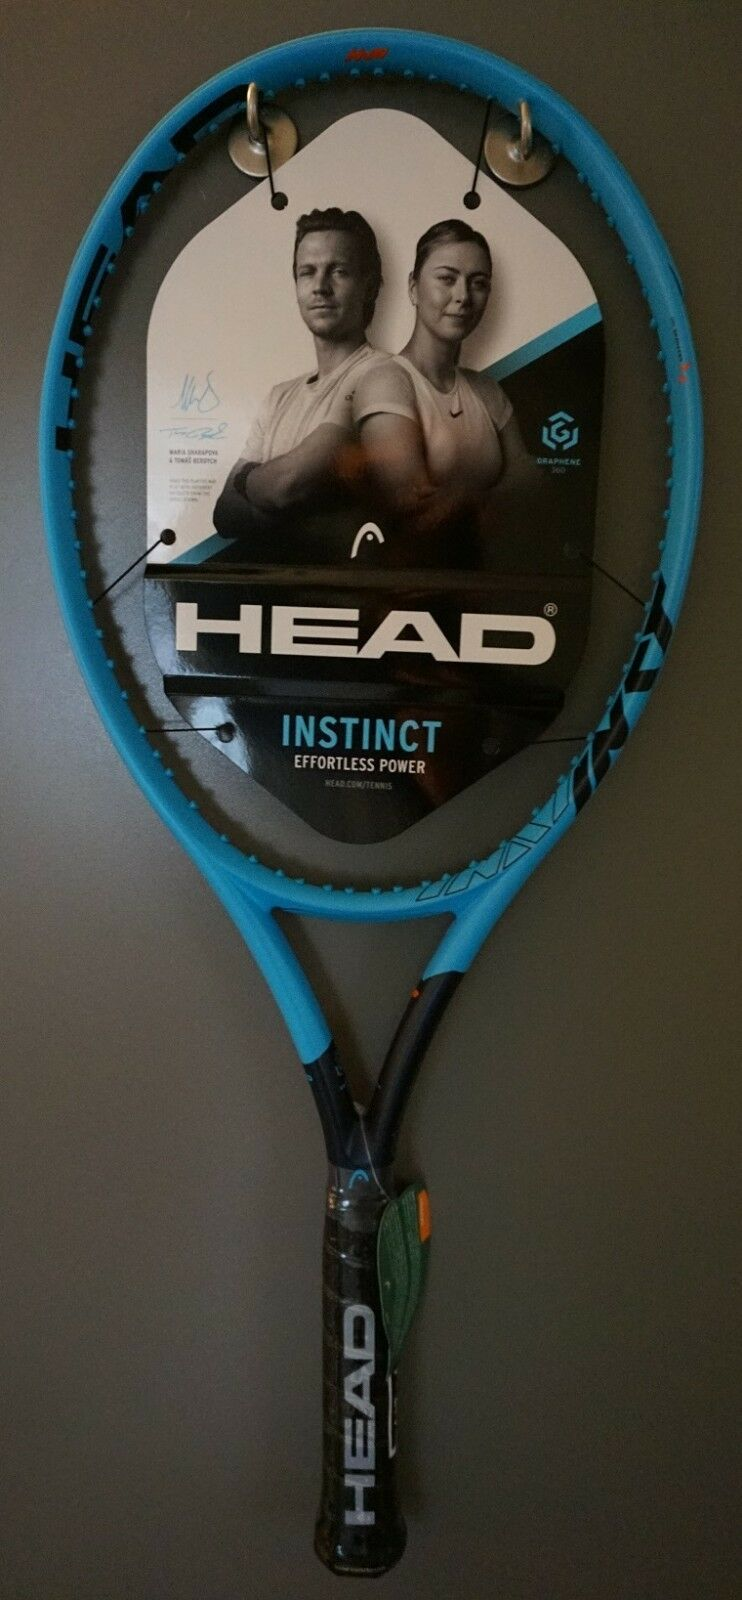 New HEAD GRAPHENE 360 INSTINCT MP 4 3 8 Tennis Racquet  LATEST 16x19